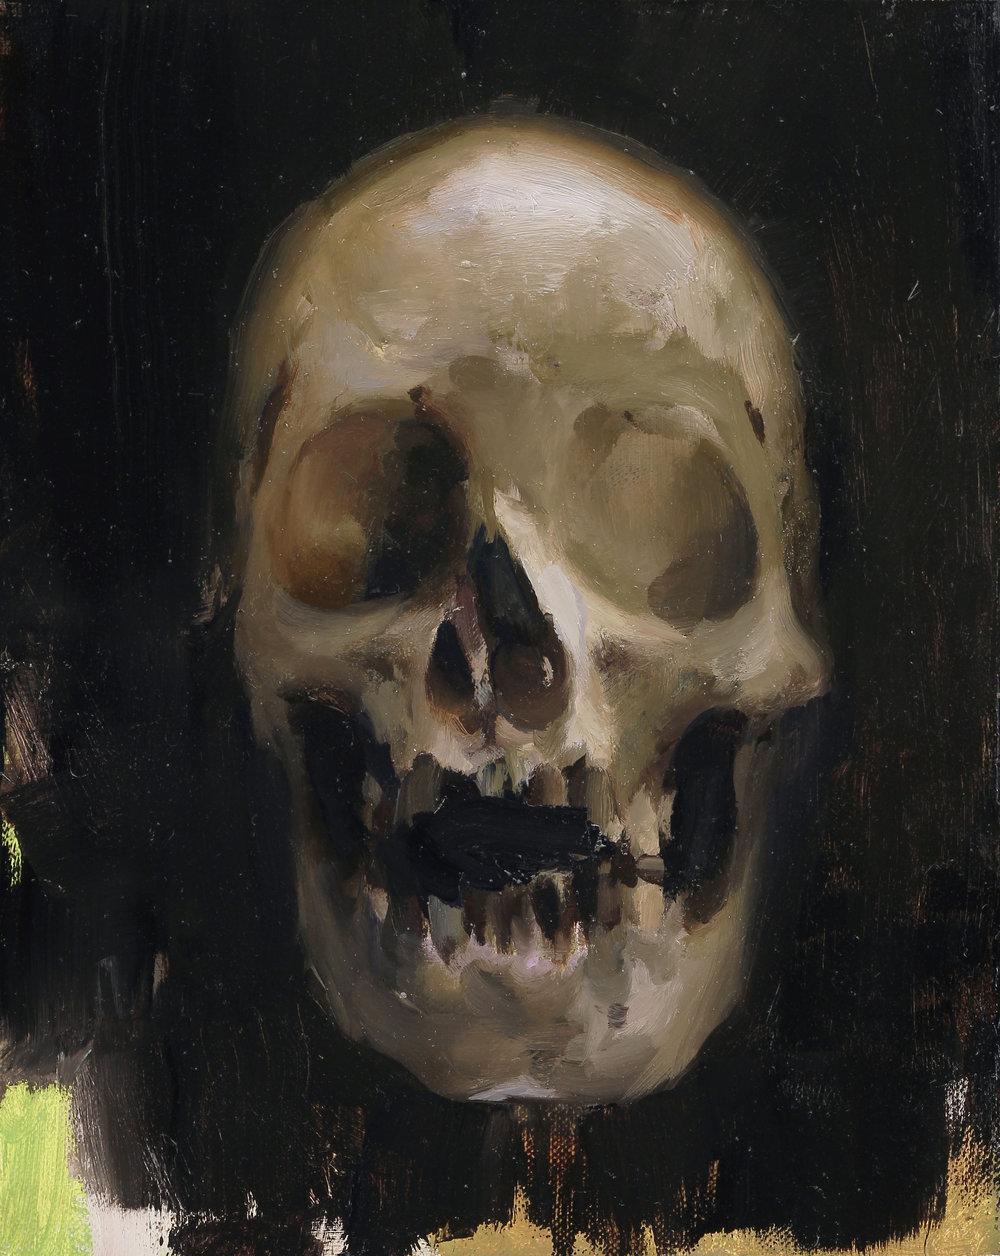 Skull 10 X 8 inches oil on aluminum panel